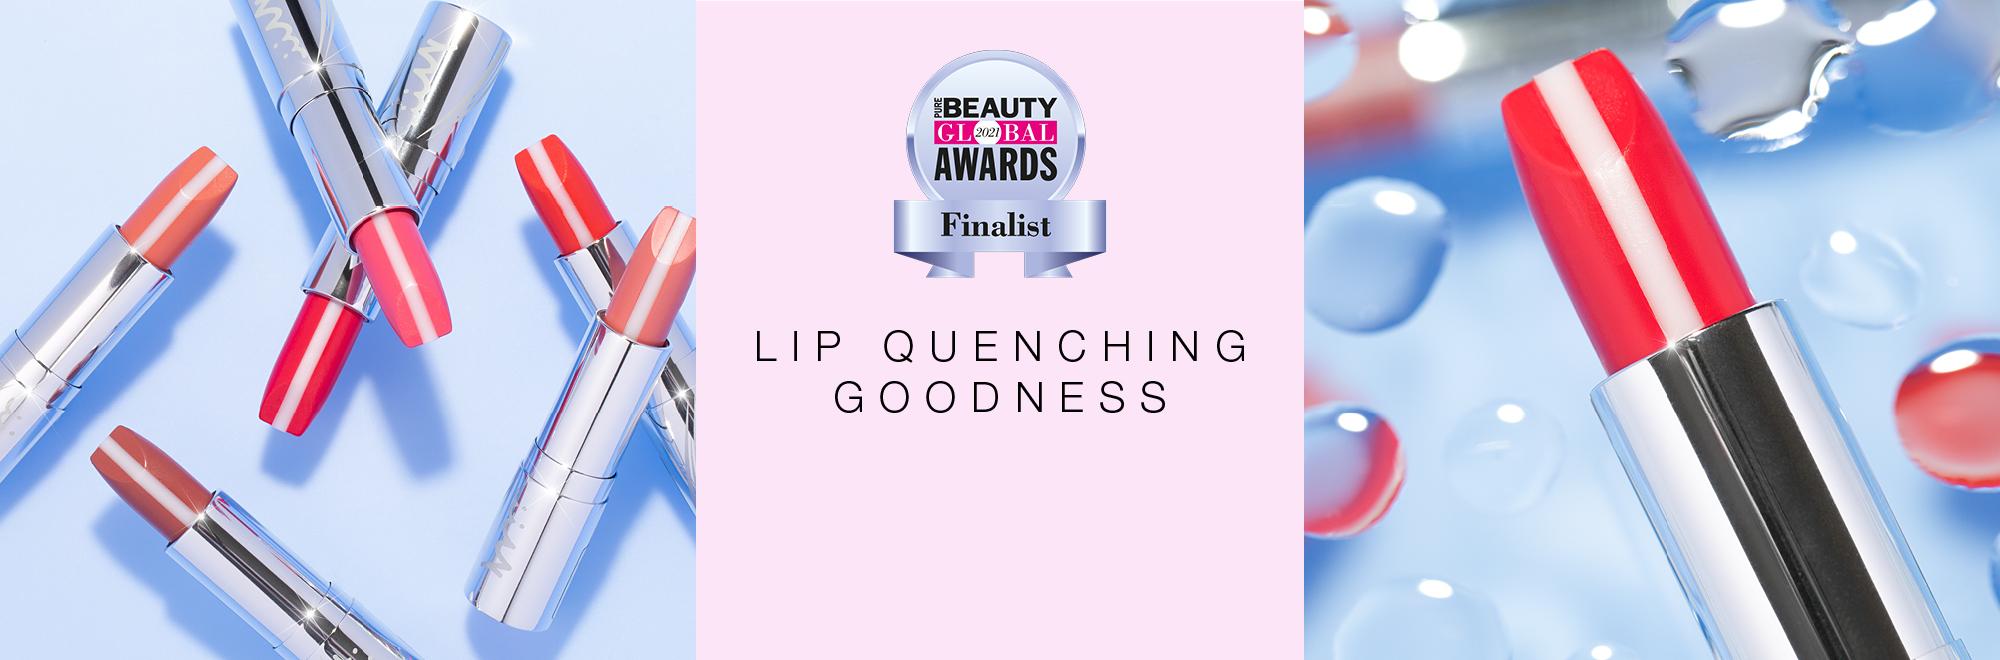 Mii Hydraboost Lip Lover Lipstick